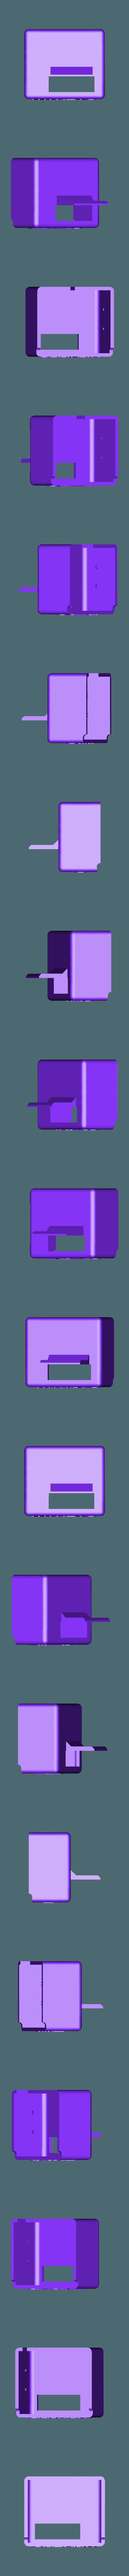 D6_BondTech_Ribbon_Cable_Holder_v1_v8.stl Download free STL file Wanhao D6 / Duplicator 6 / Monoprice Ultimate Maker Ribbon Cable Holder for BondTech • 3D print object, nik101968